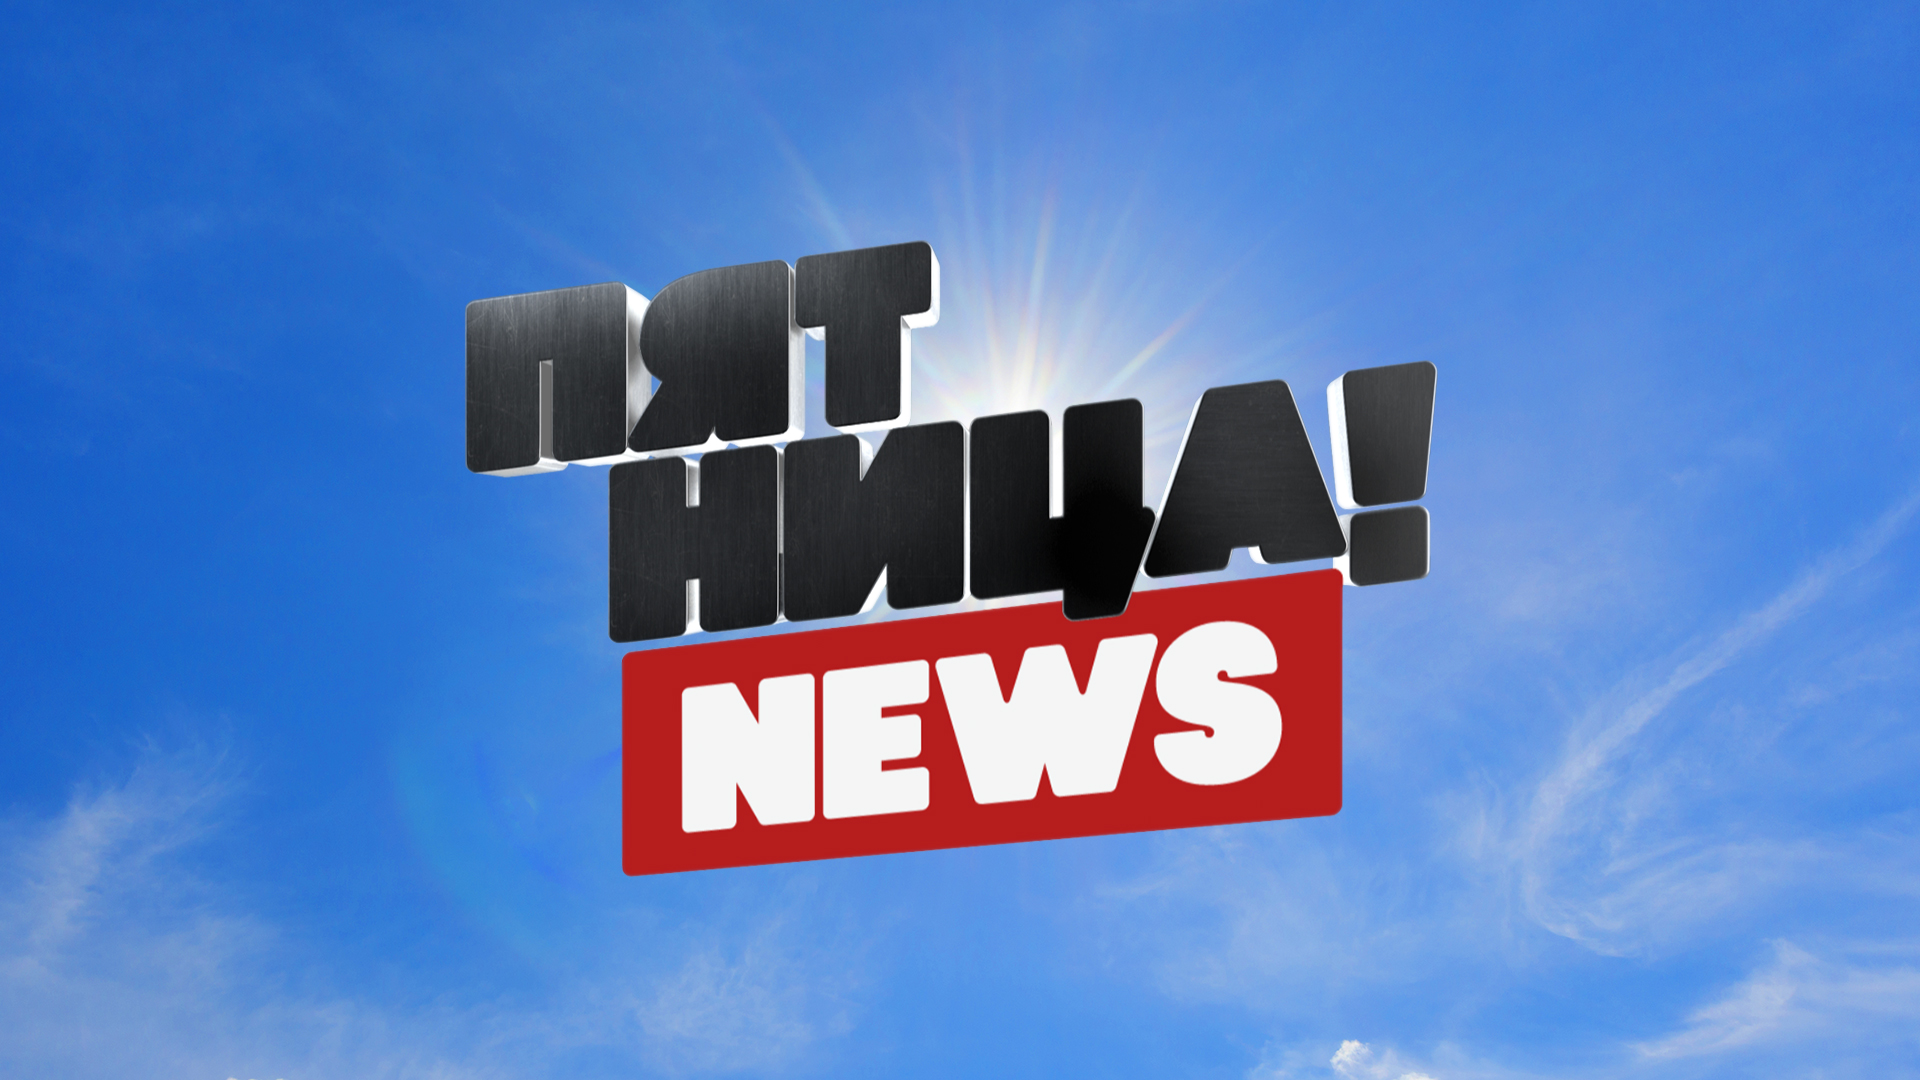 Пятница News